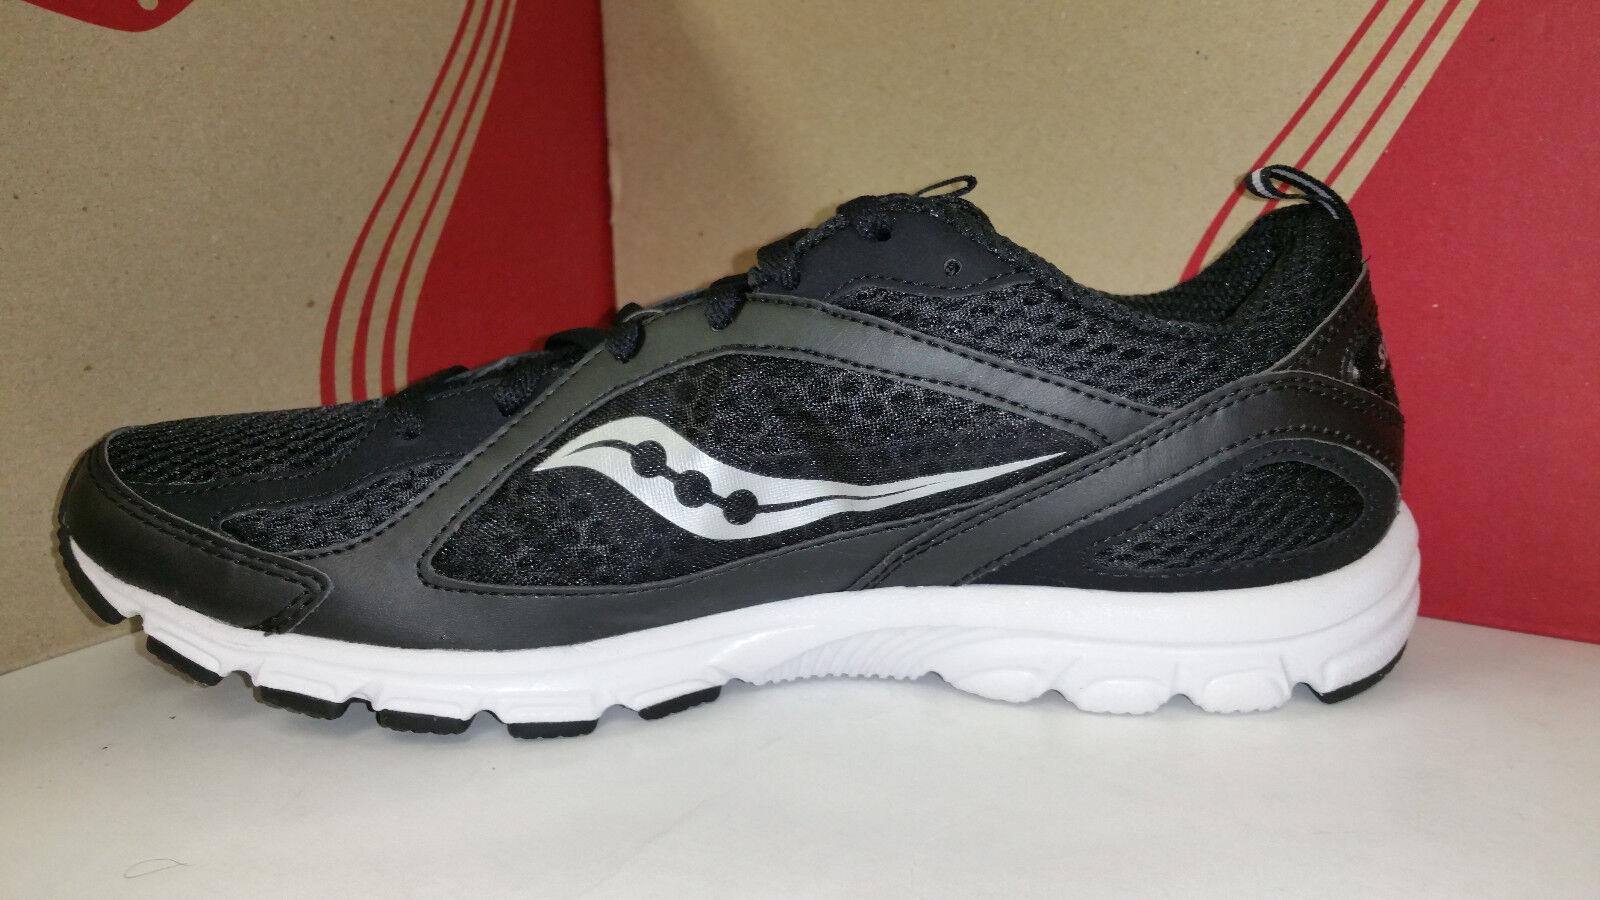 Saucony Uomo Grid Grid Grid Fiya nero bianca Light Weight Running scarpe Dimensione 7.5-13 9695d0